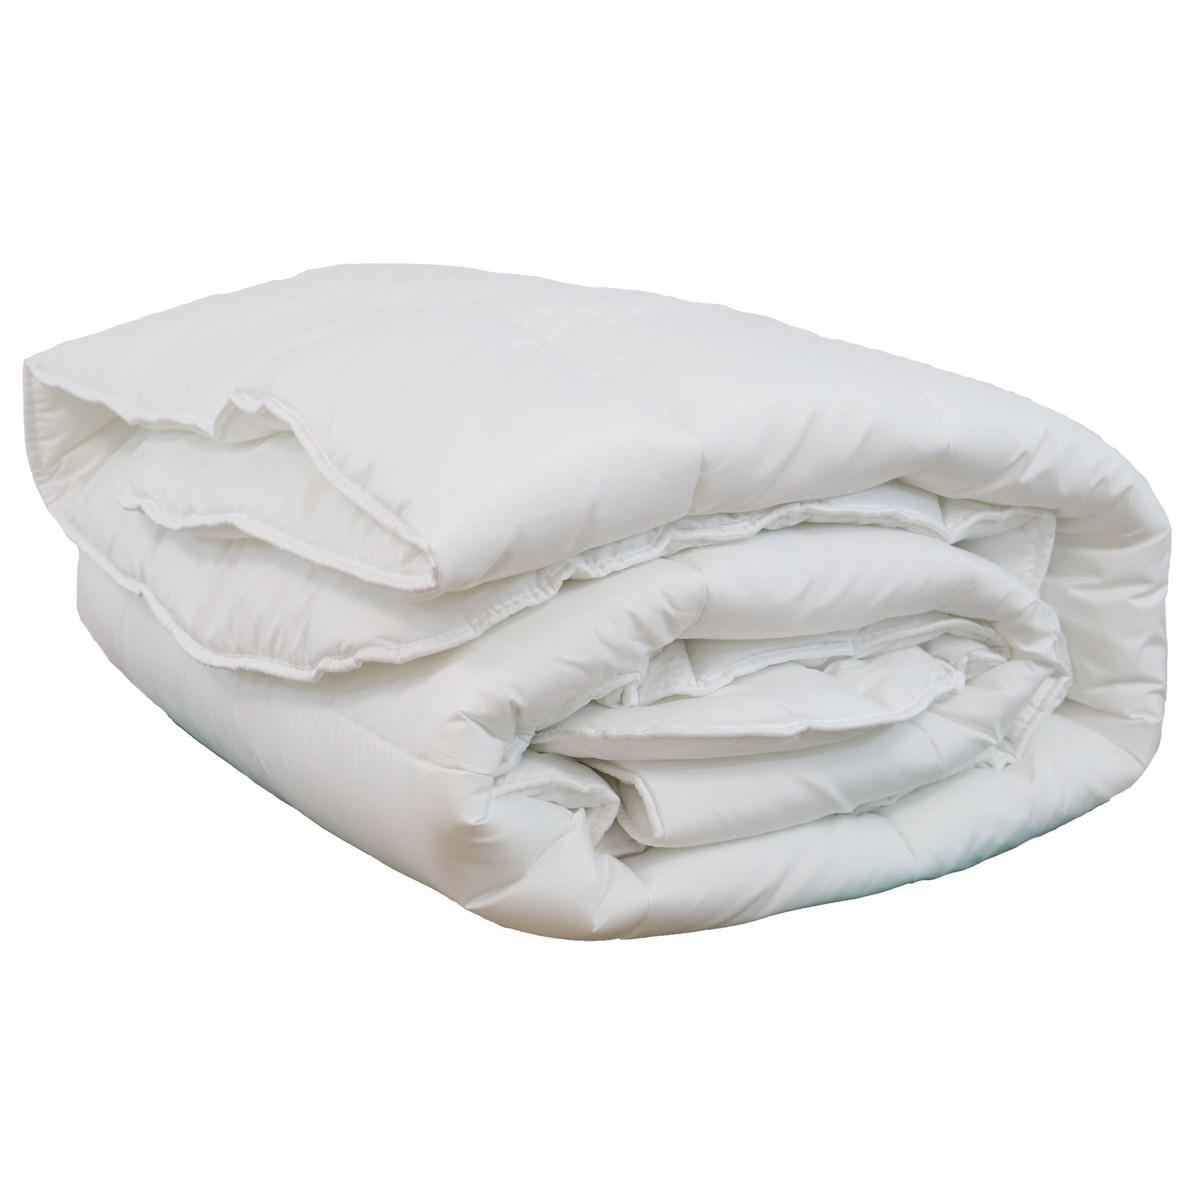 Couette blanche 550gr hiver en polyester blanc 140x200 cm